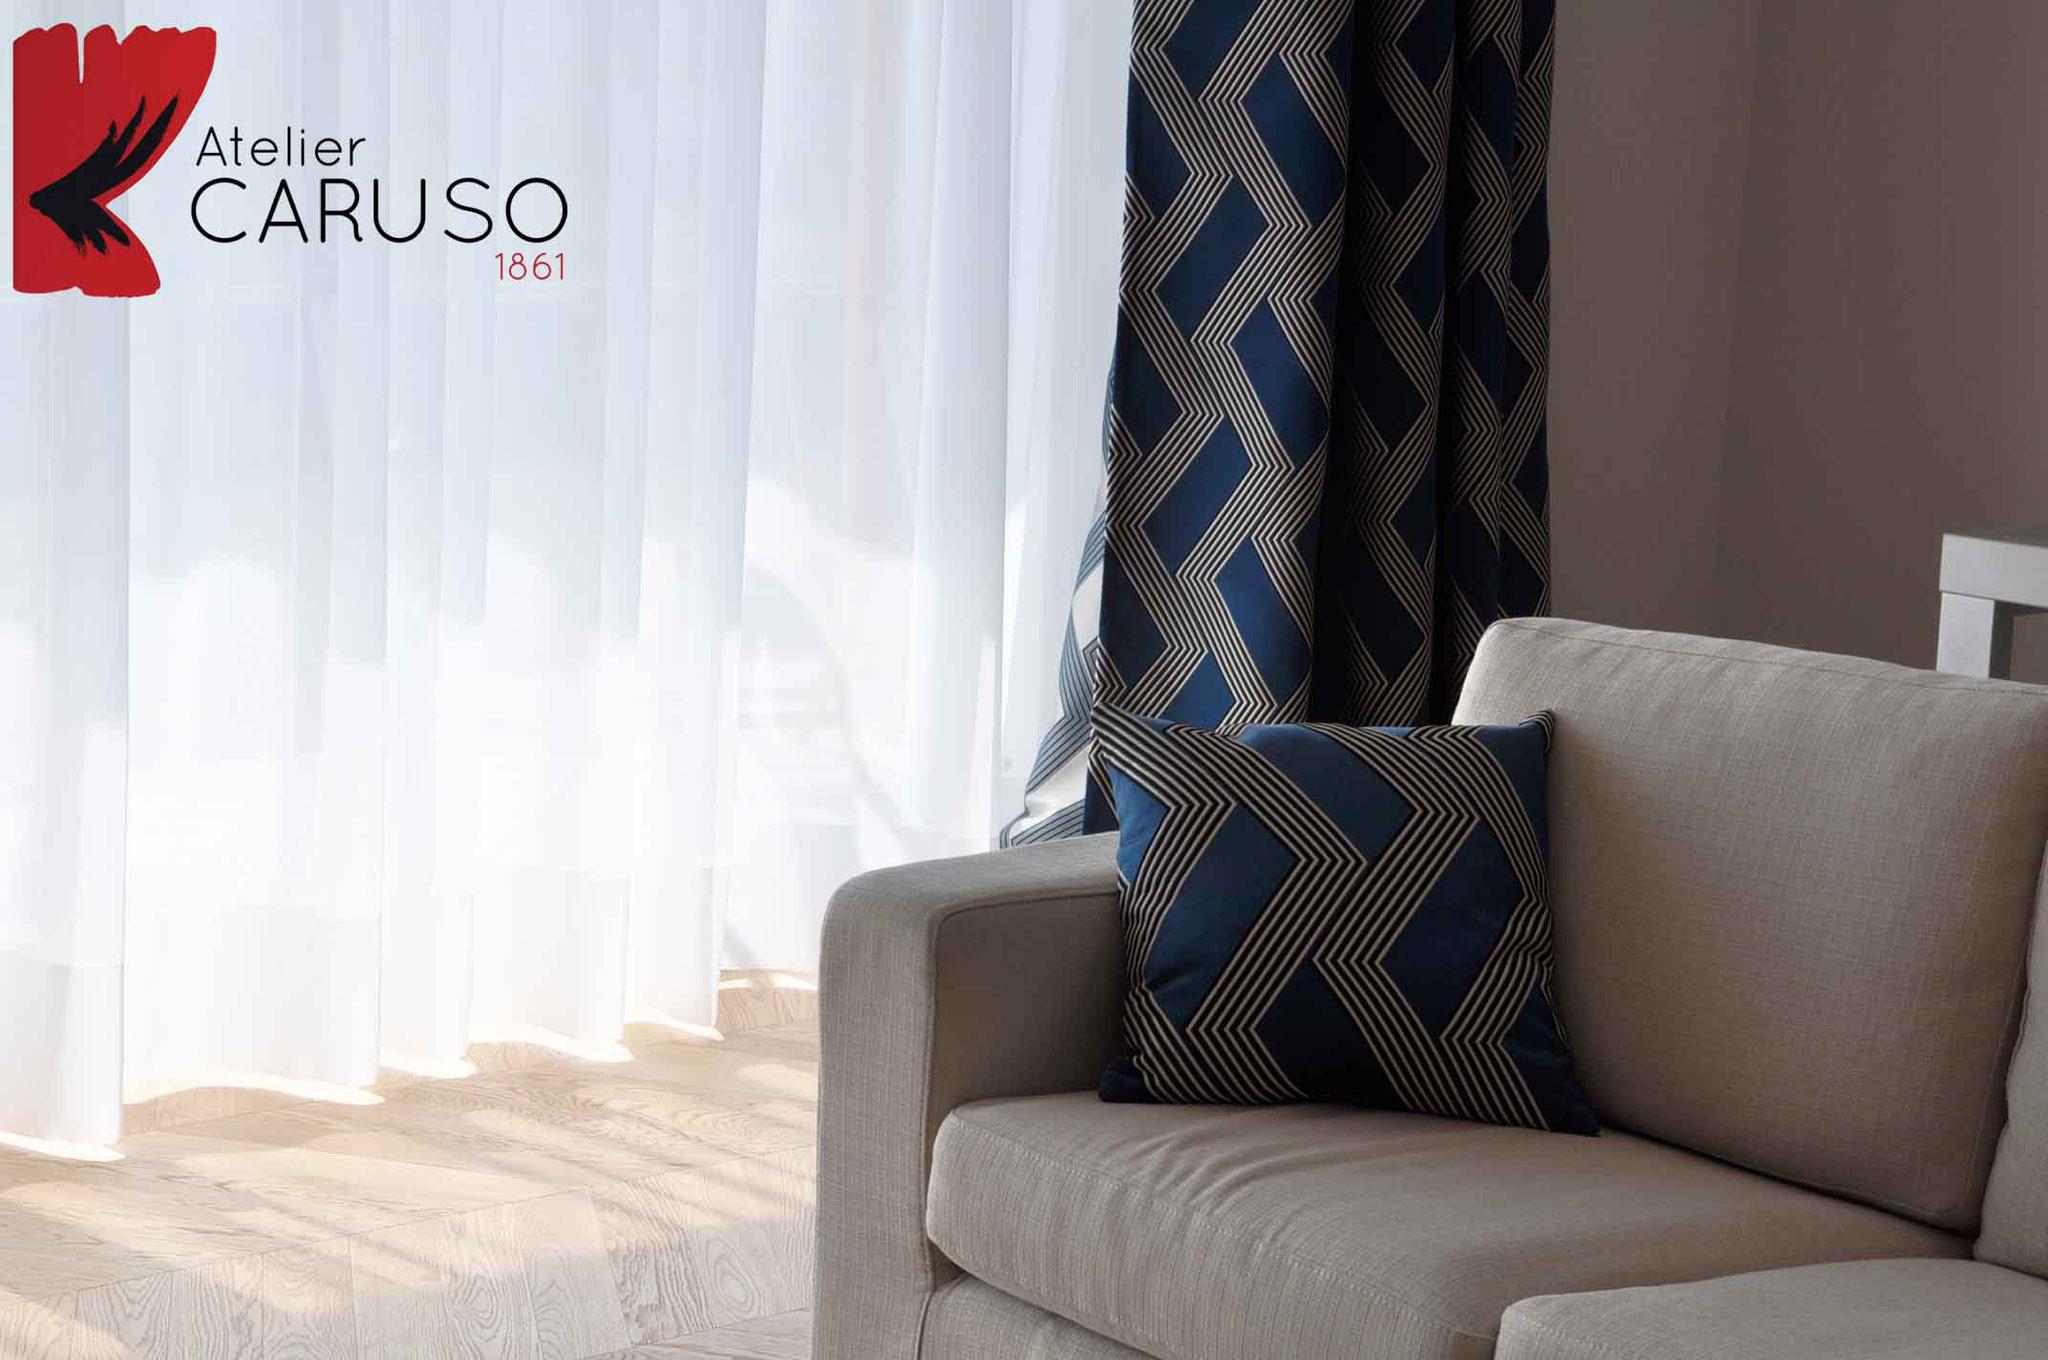 Tende moderne atelier tessuti arredamento tende tendaggi interni - Tende d arredo moderne per interni ...